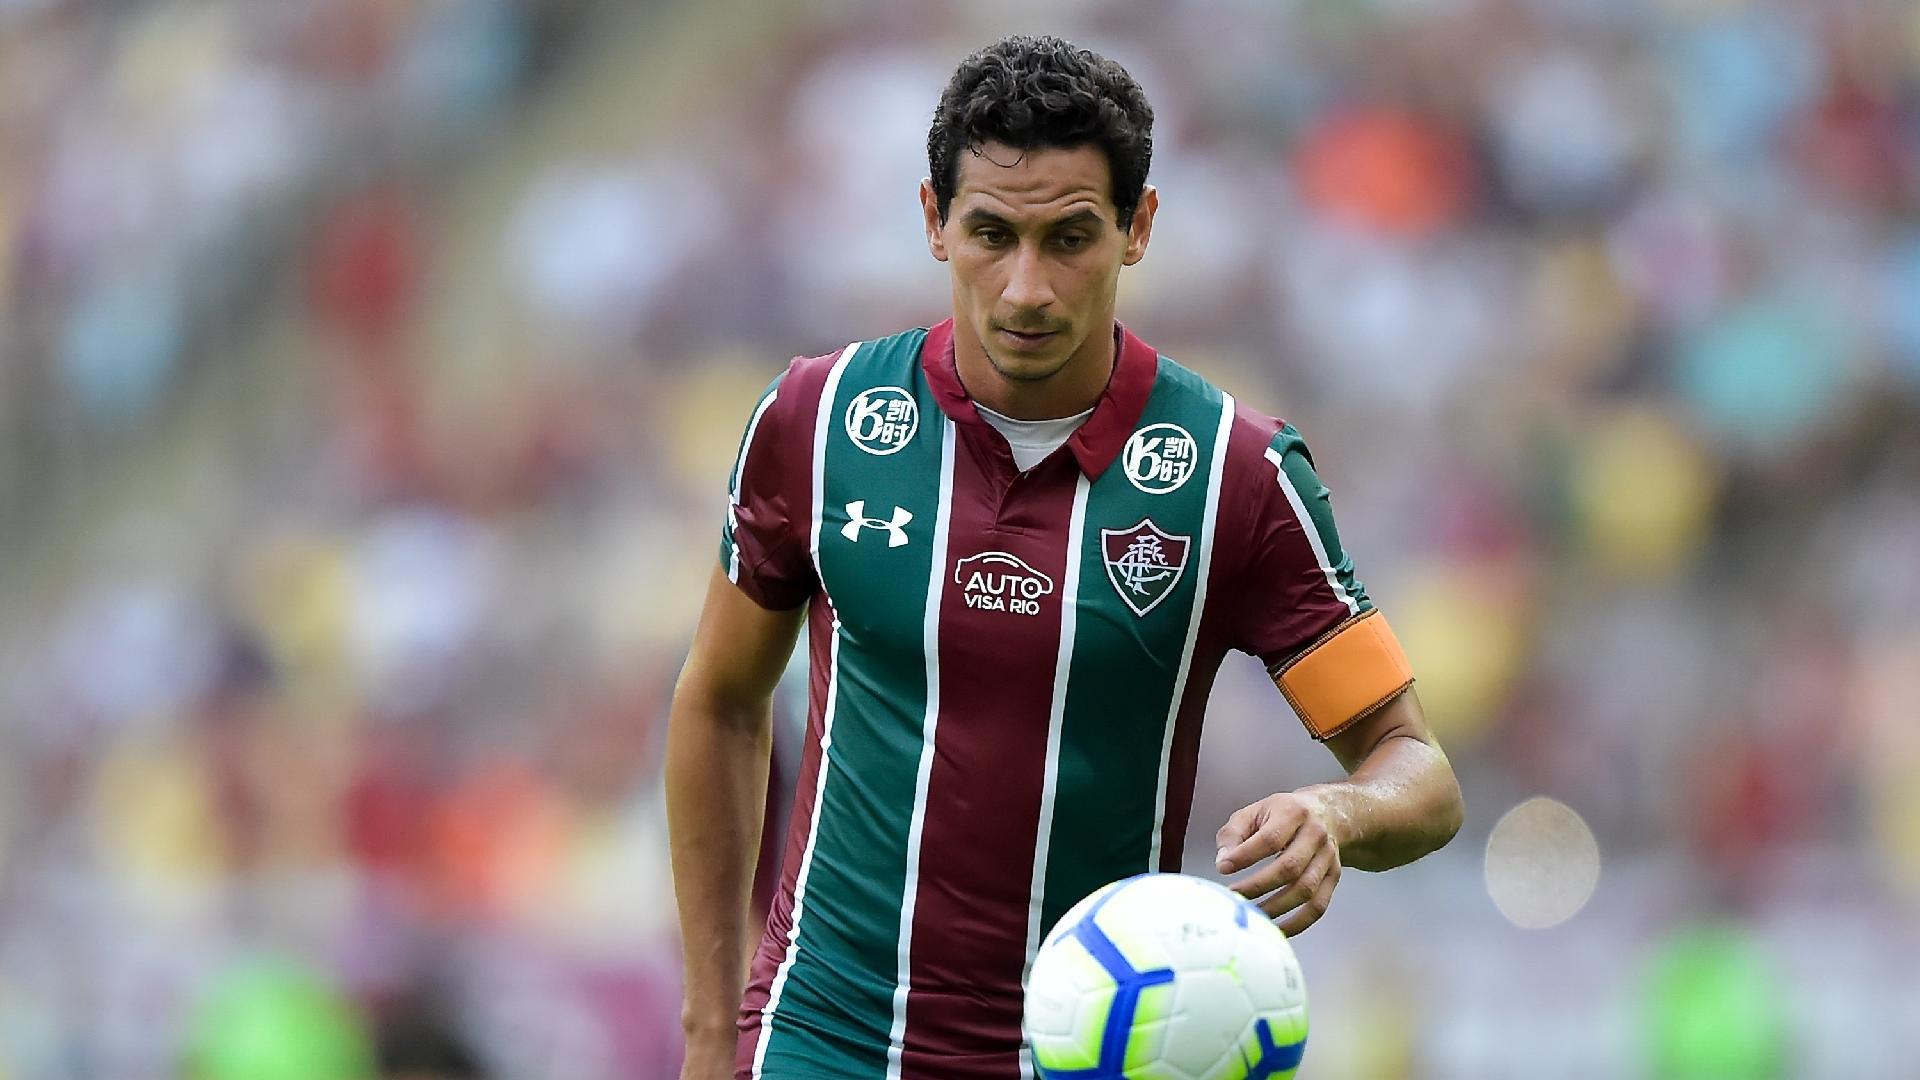 Paulo Henrique Ganso domina a bola em jogo entre Fluminense e CSA